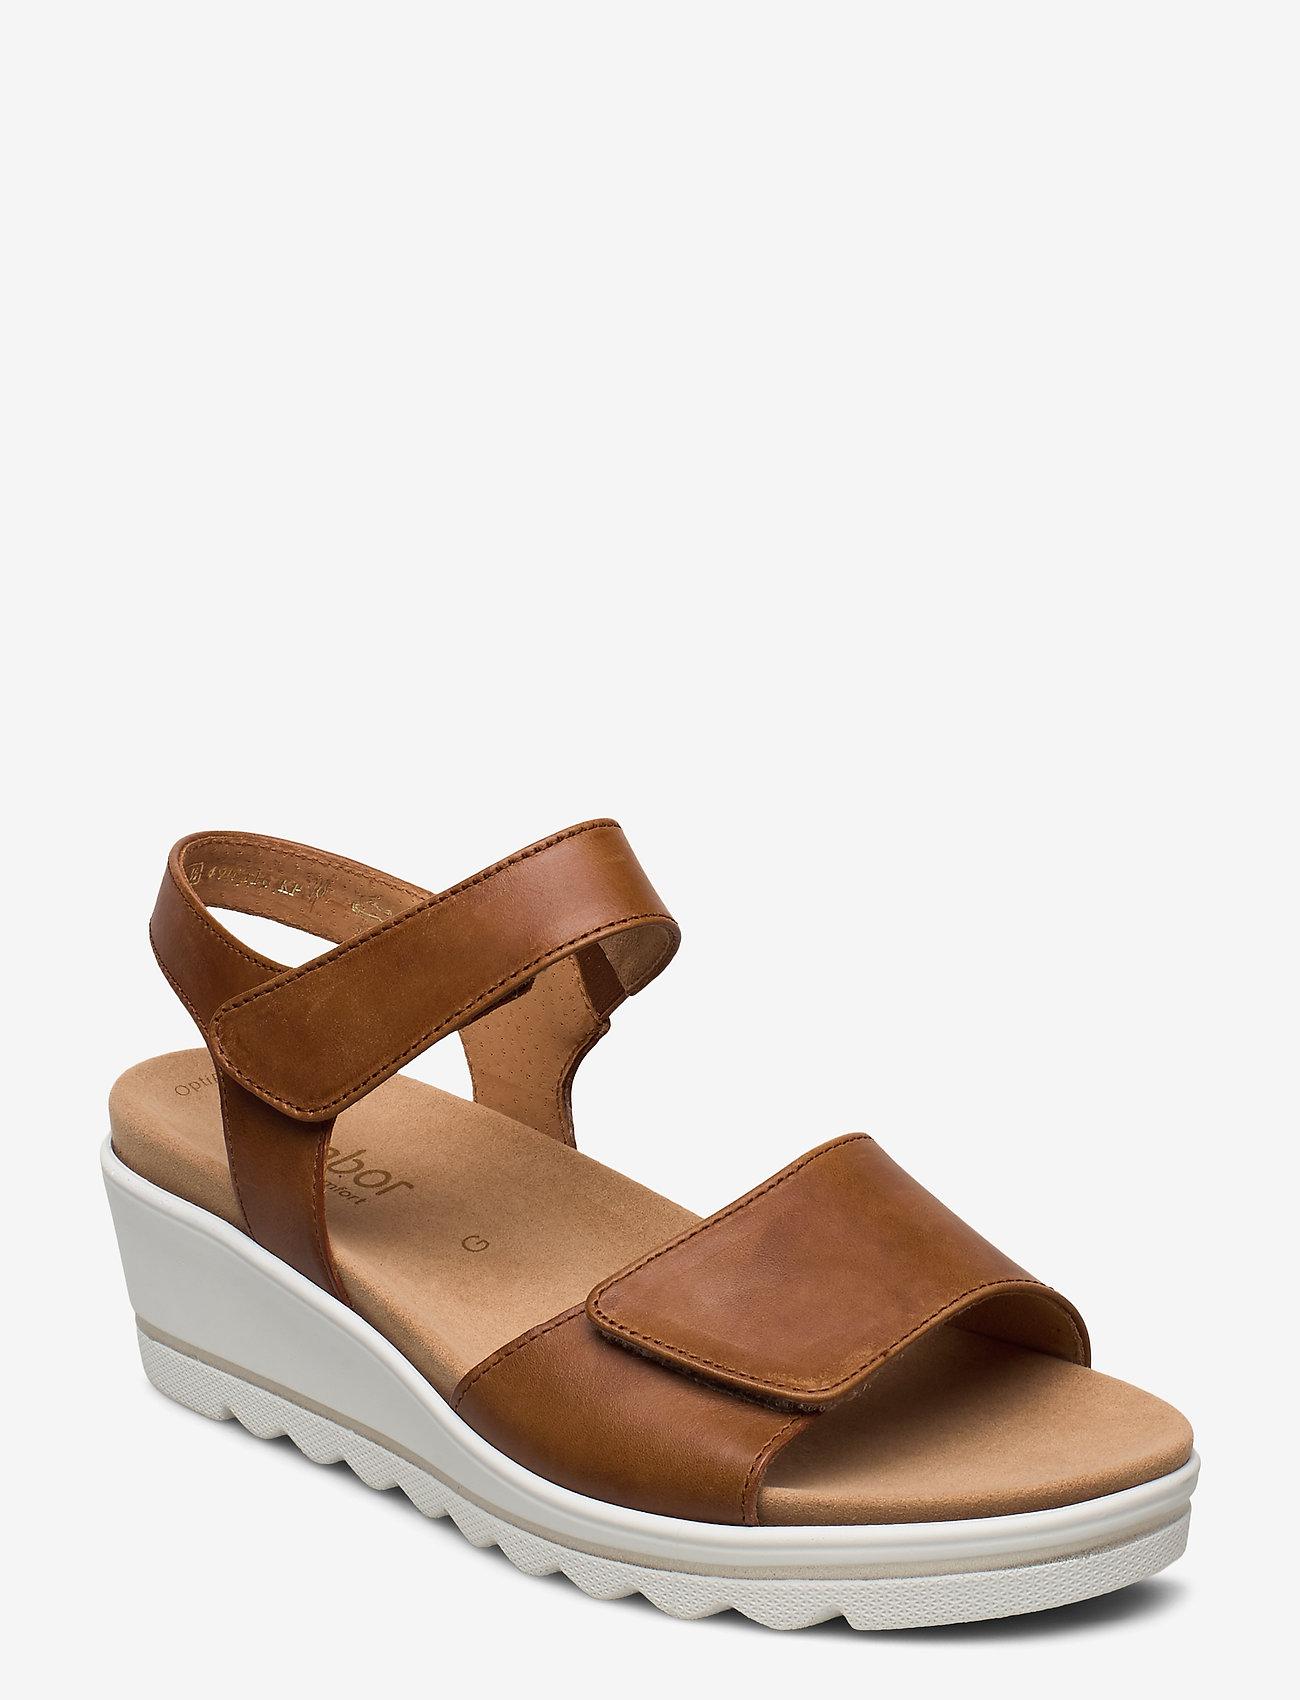 Gabor - sandals - høyhælte sandaler - beige